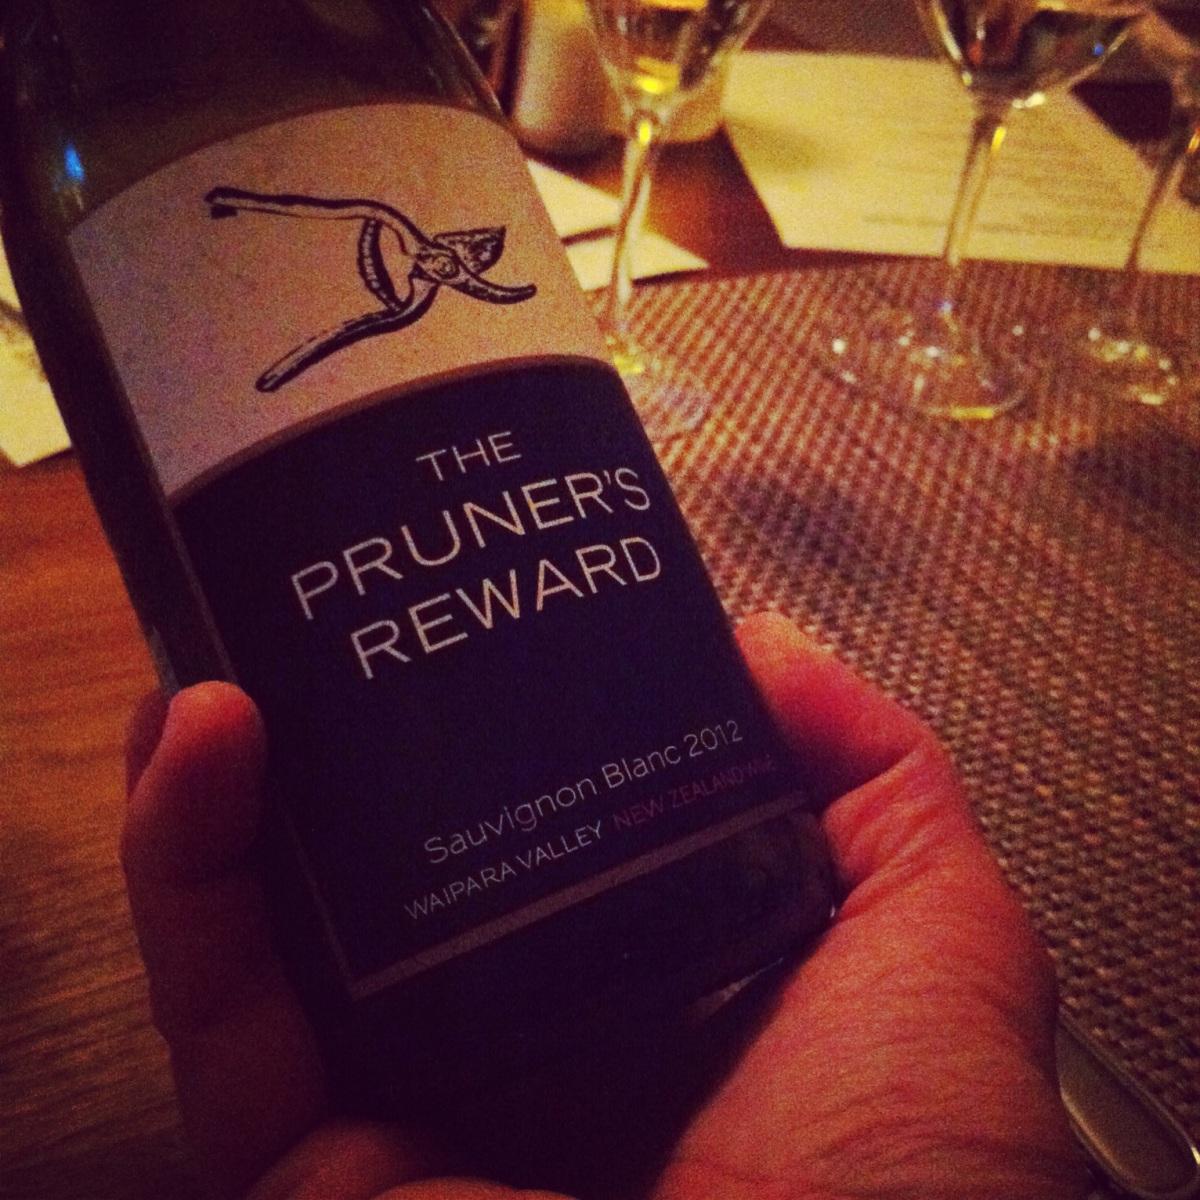 The Pruner's Reward, Pinot noir, waipara Valley, Nouvelle - Zélande, 2011